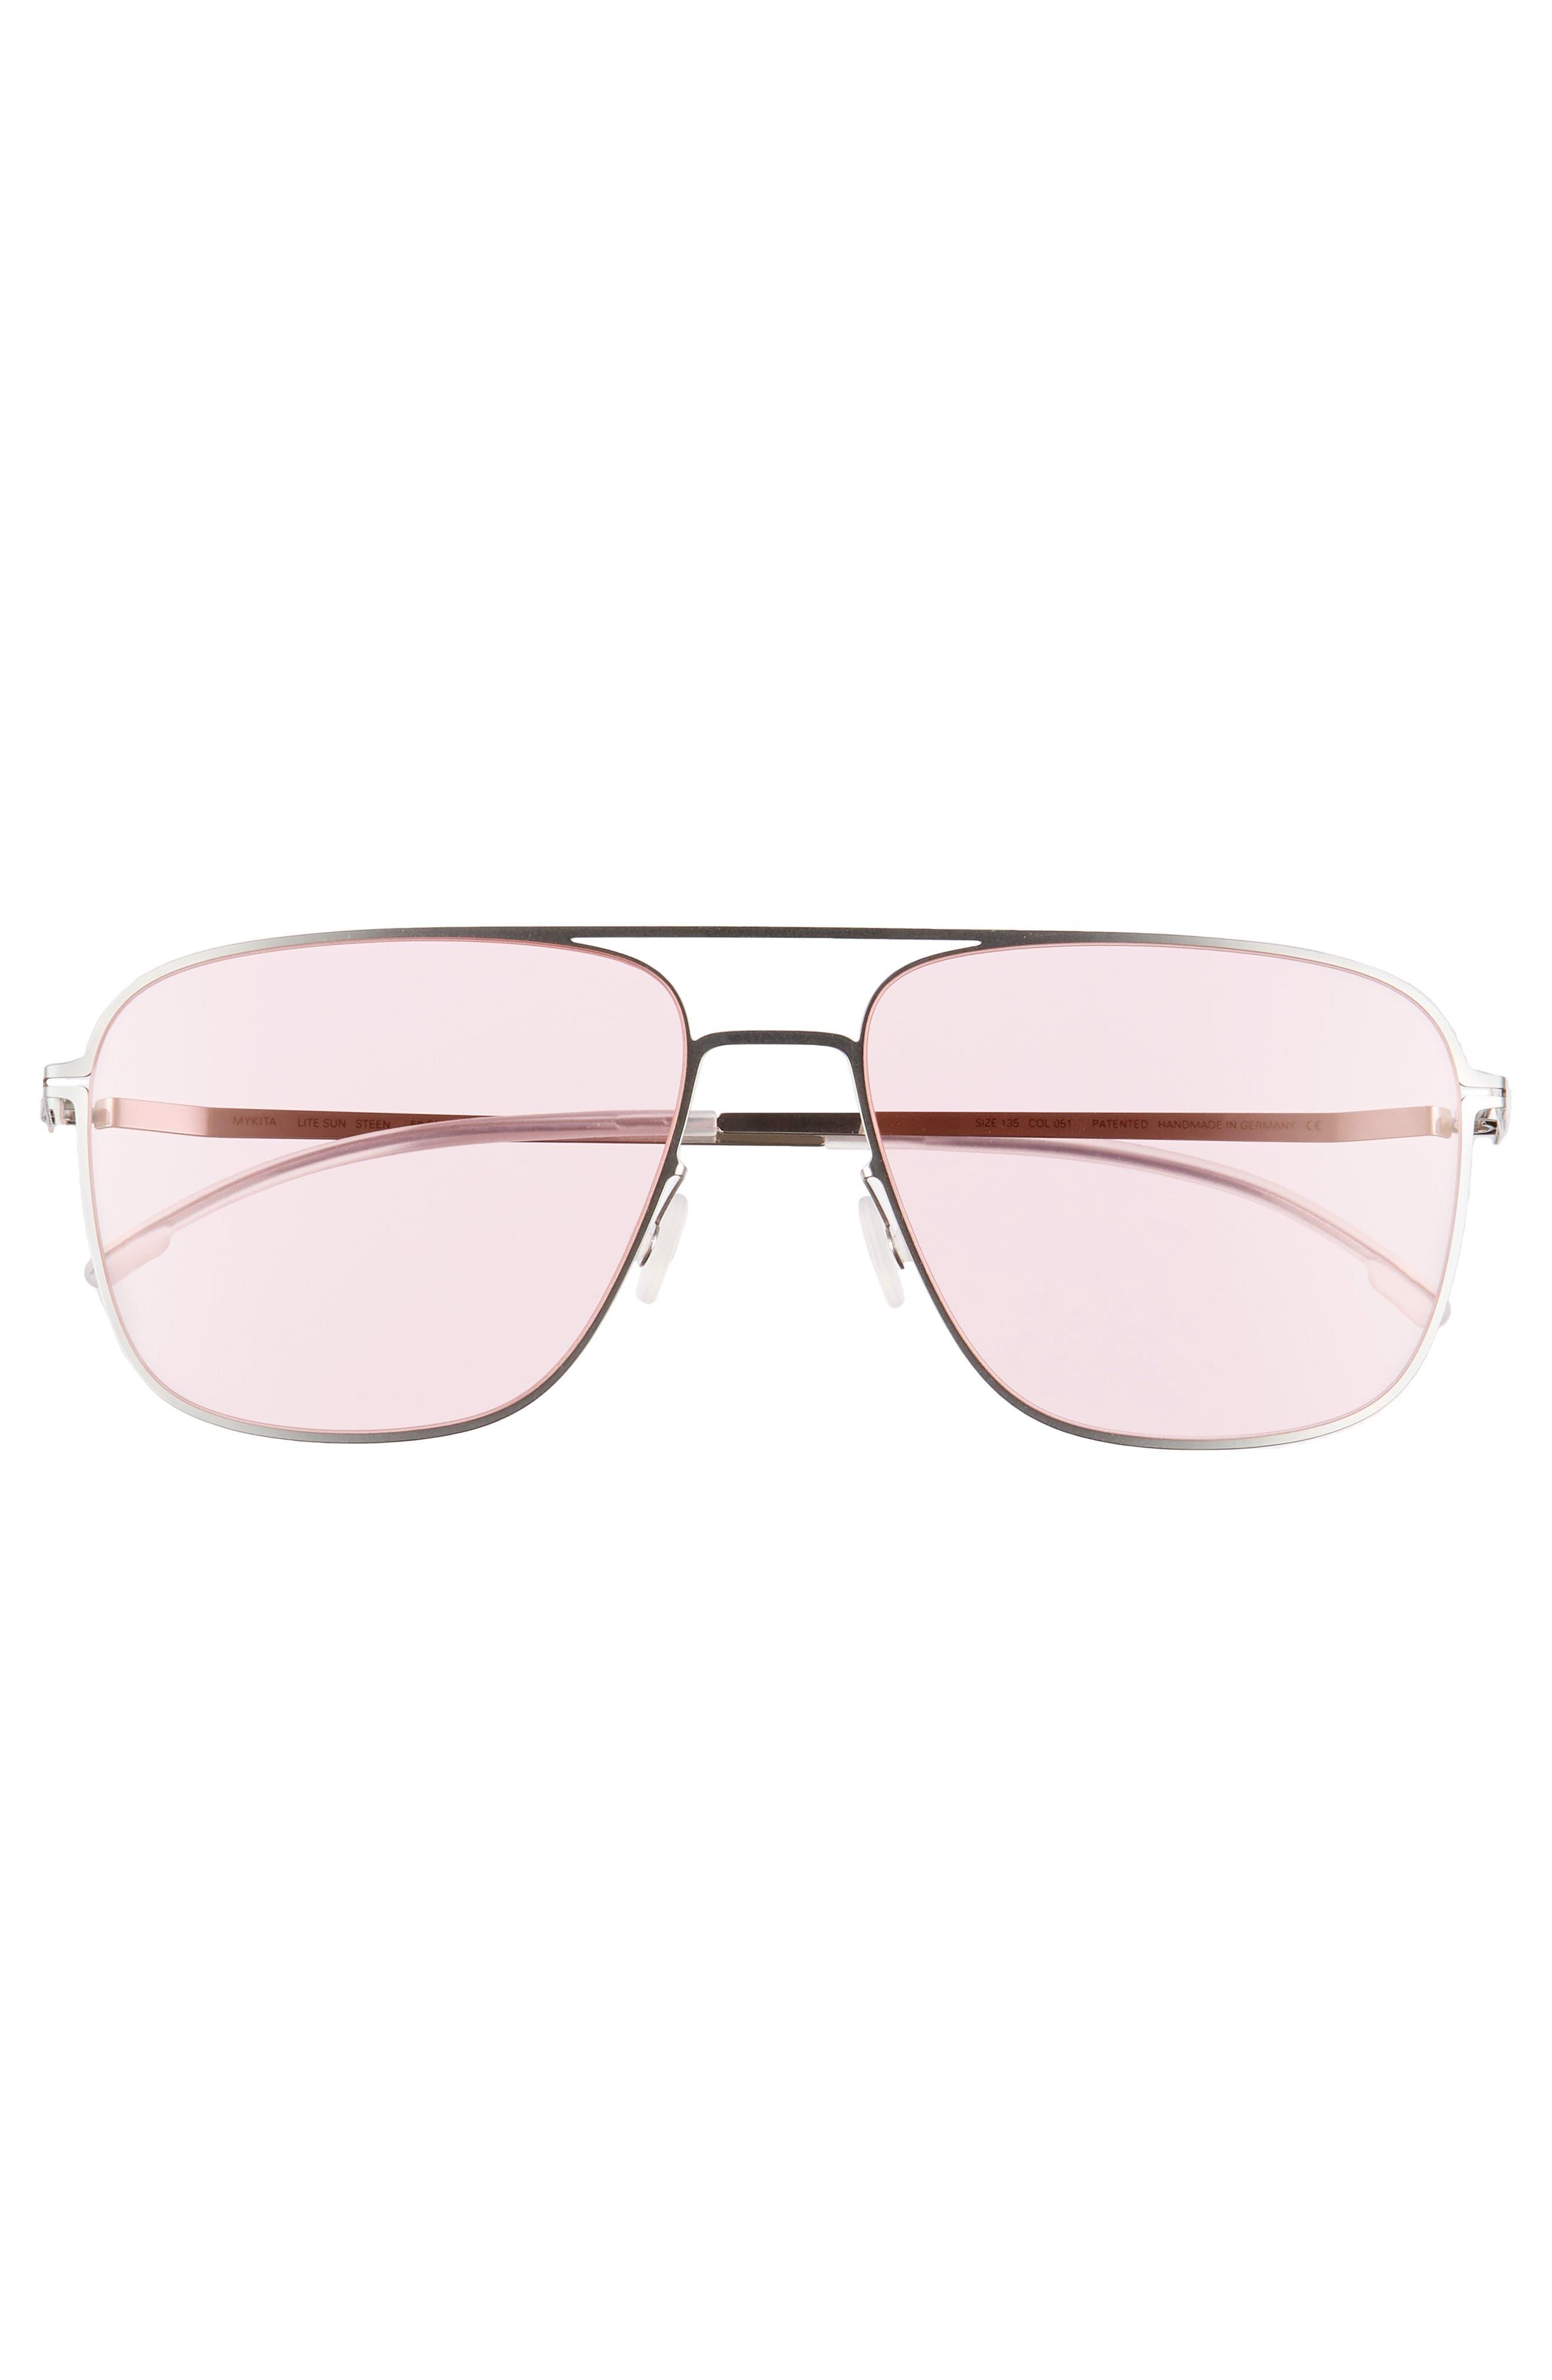 Steen 56mm Aviator Sunglasses,                             Alternate thumbnail 2, color,